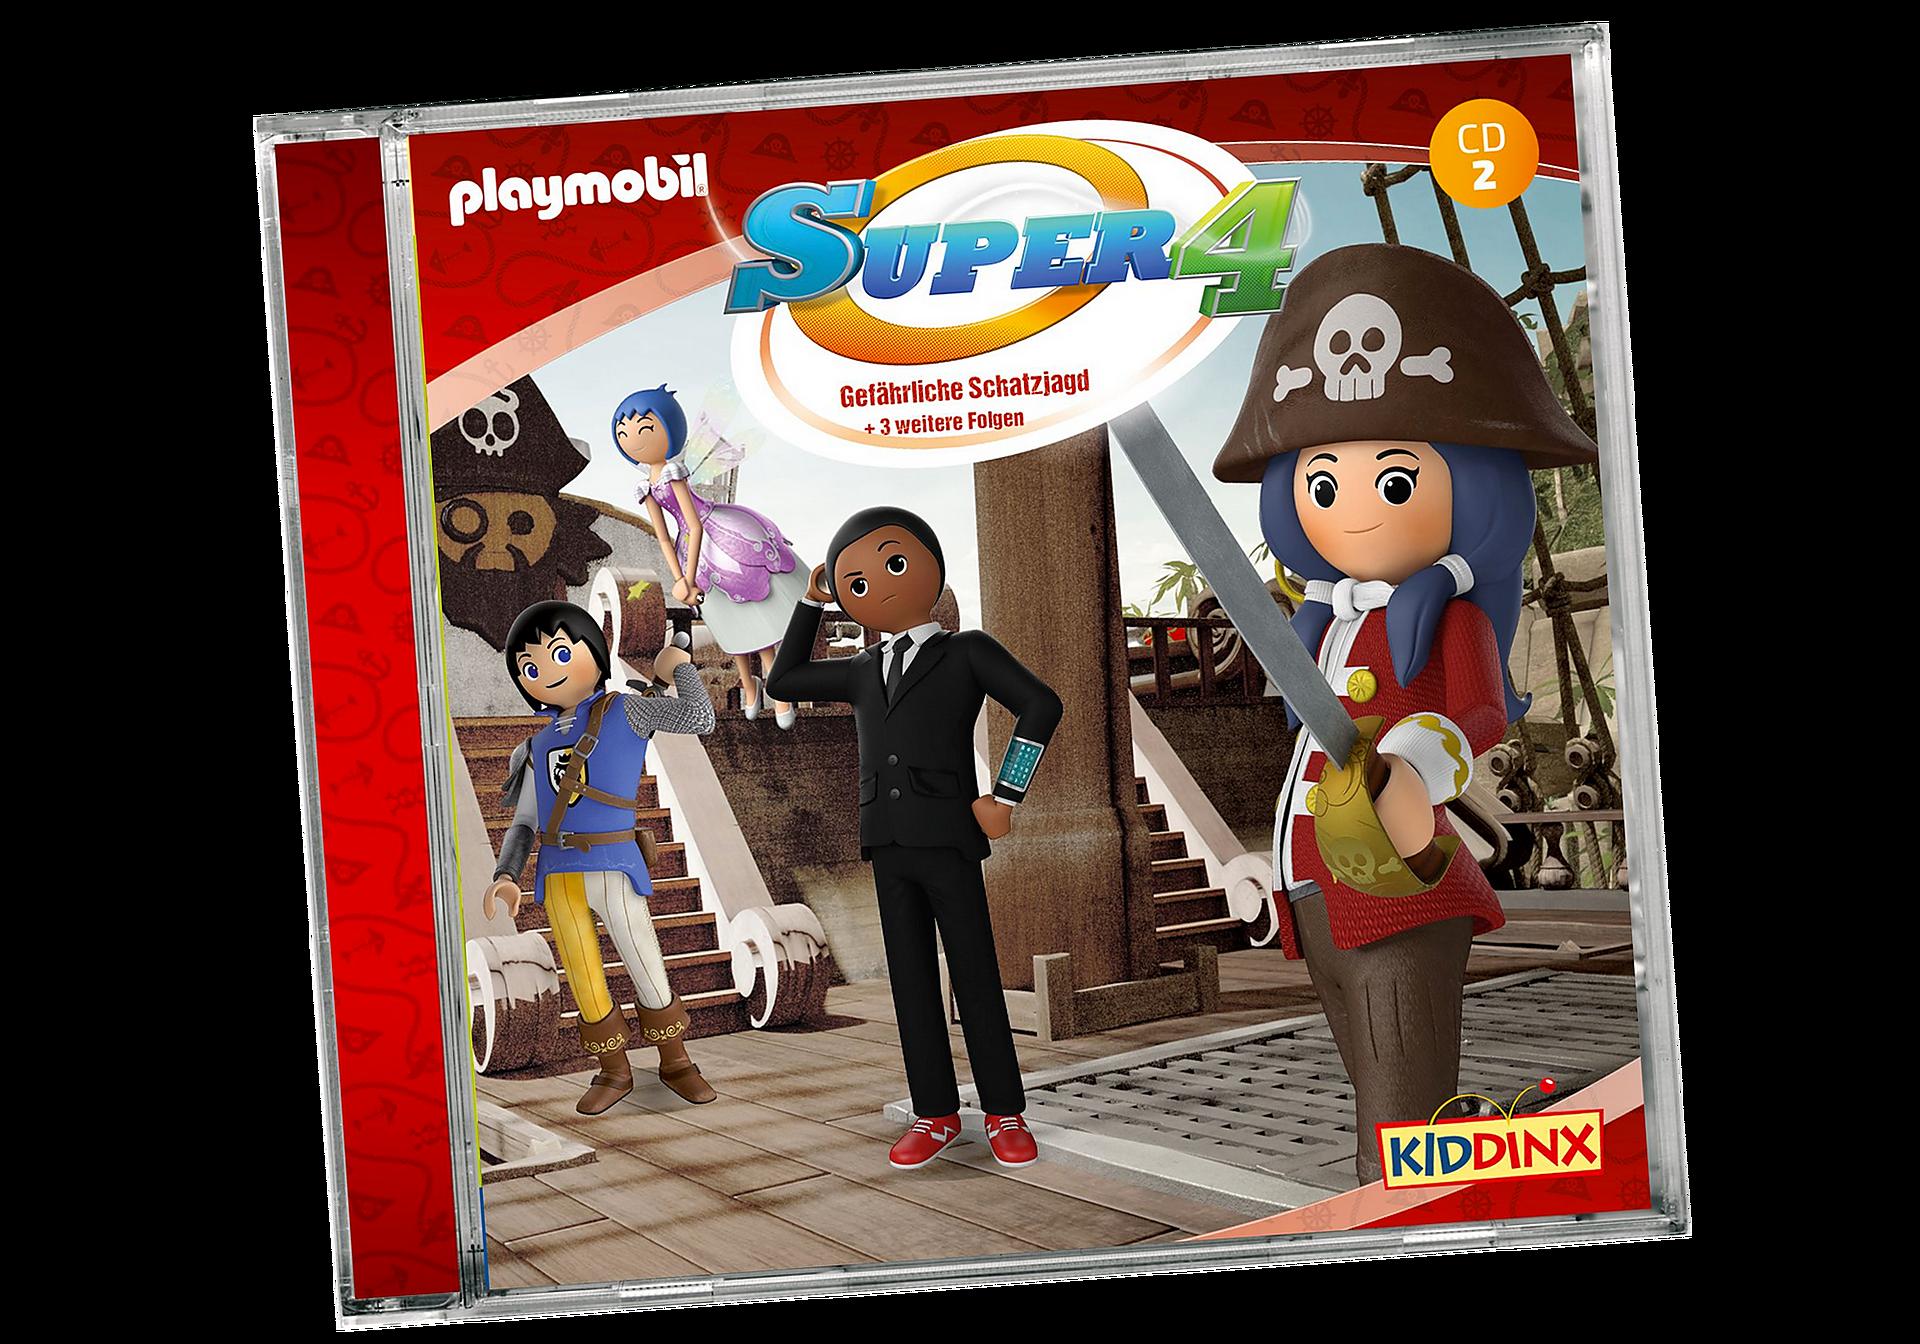 http://media.playmobil.com/i/playmobil/80475_product_detail/CD 2 Super4: Gefährliche Schatzjagd